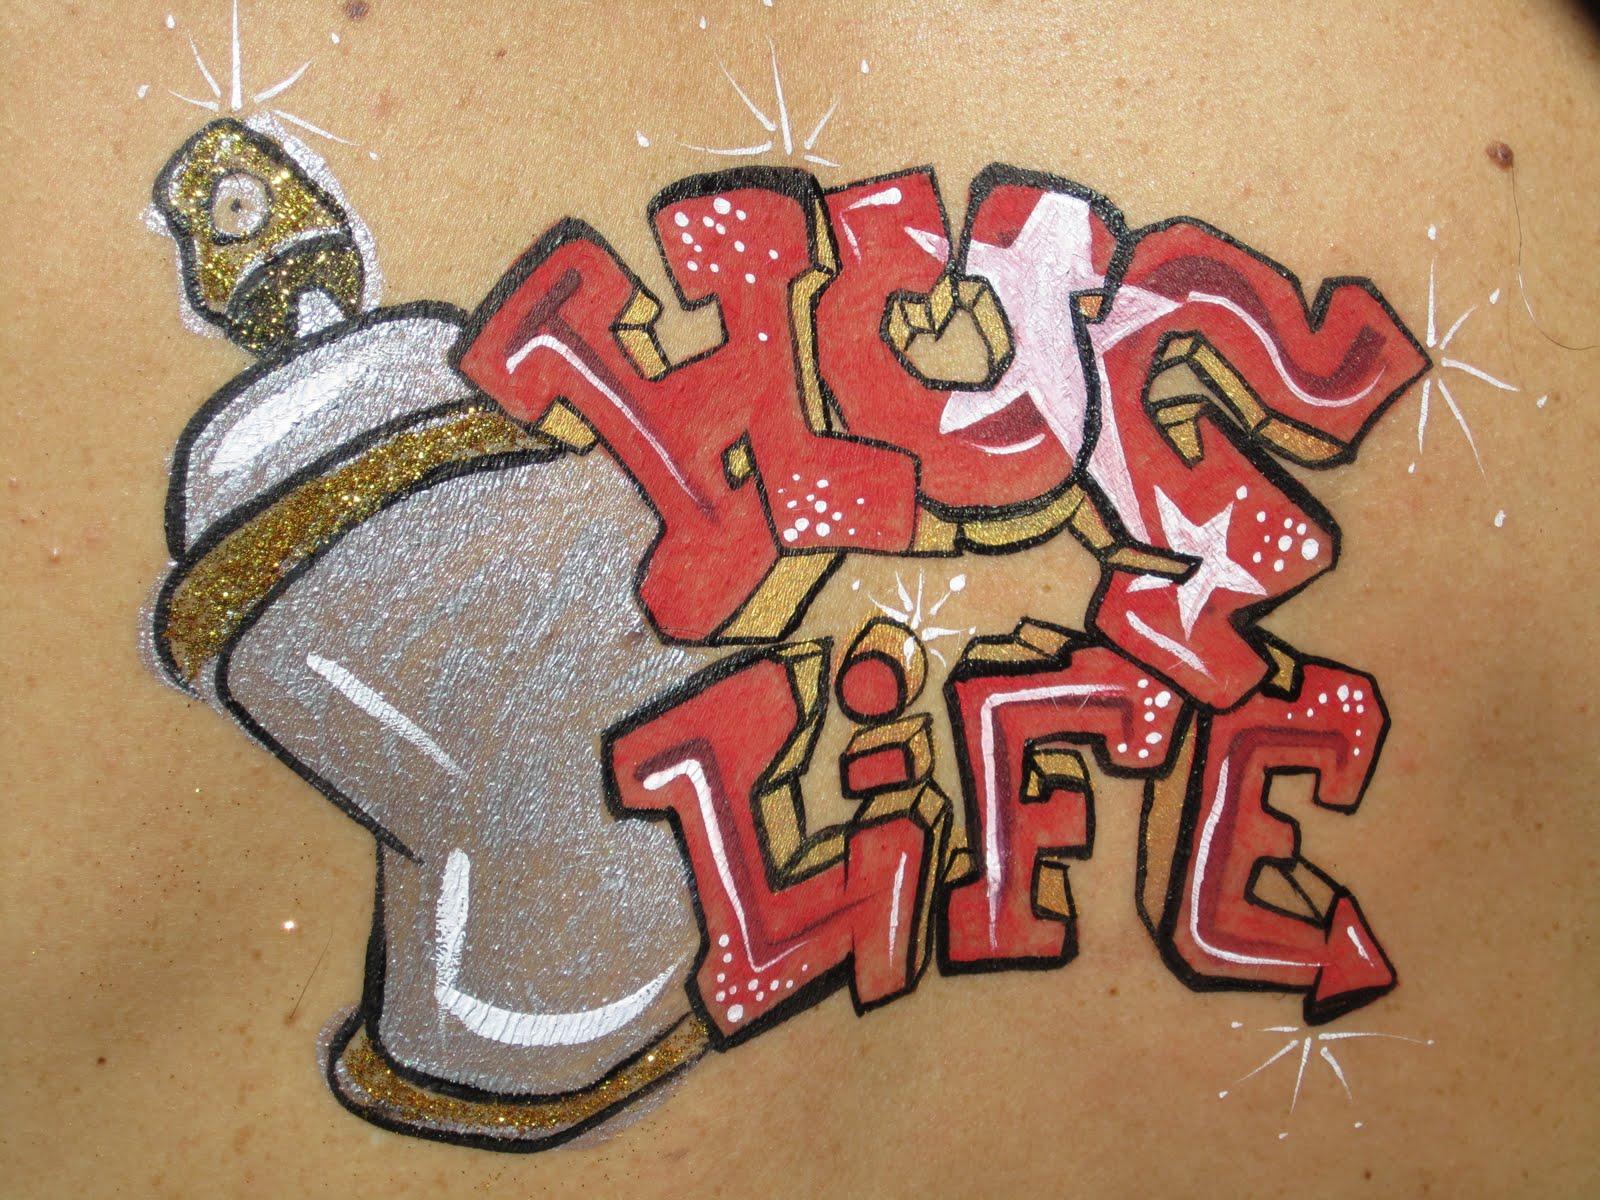 Thug Life Graffiti Thug Life Uluda s zl k